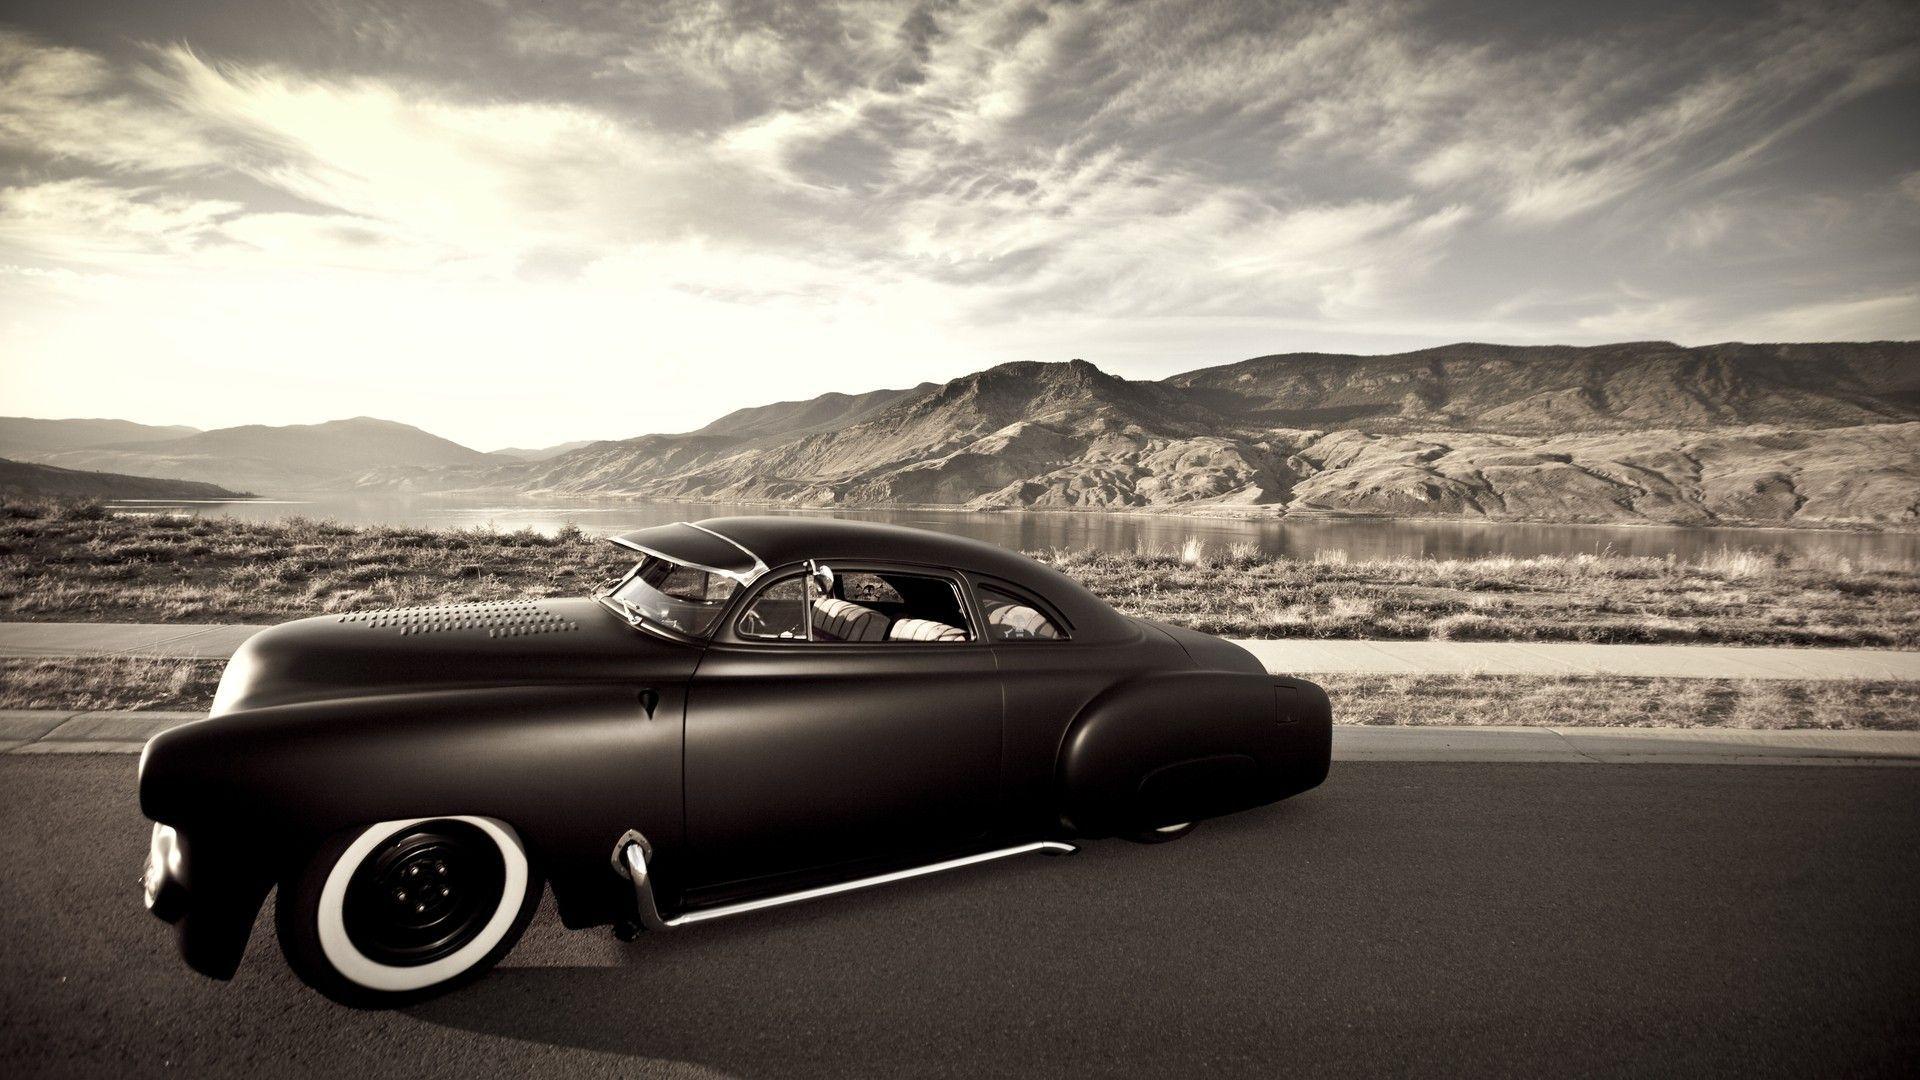 Vehicles Cars Rat Rod Hot Custom Lowrider Sepia Iphone